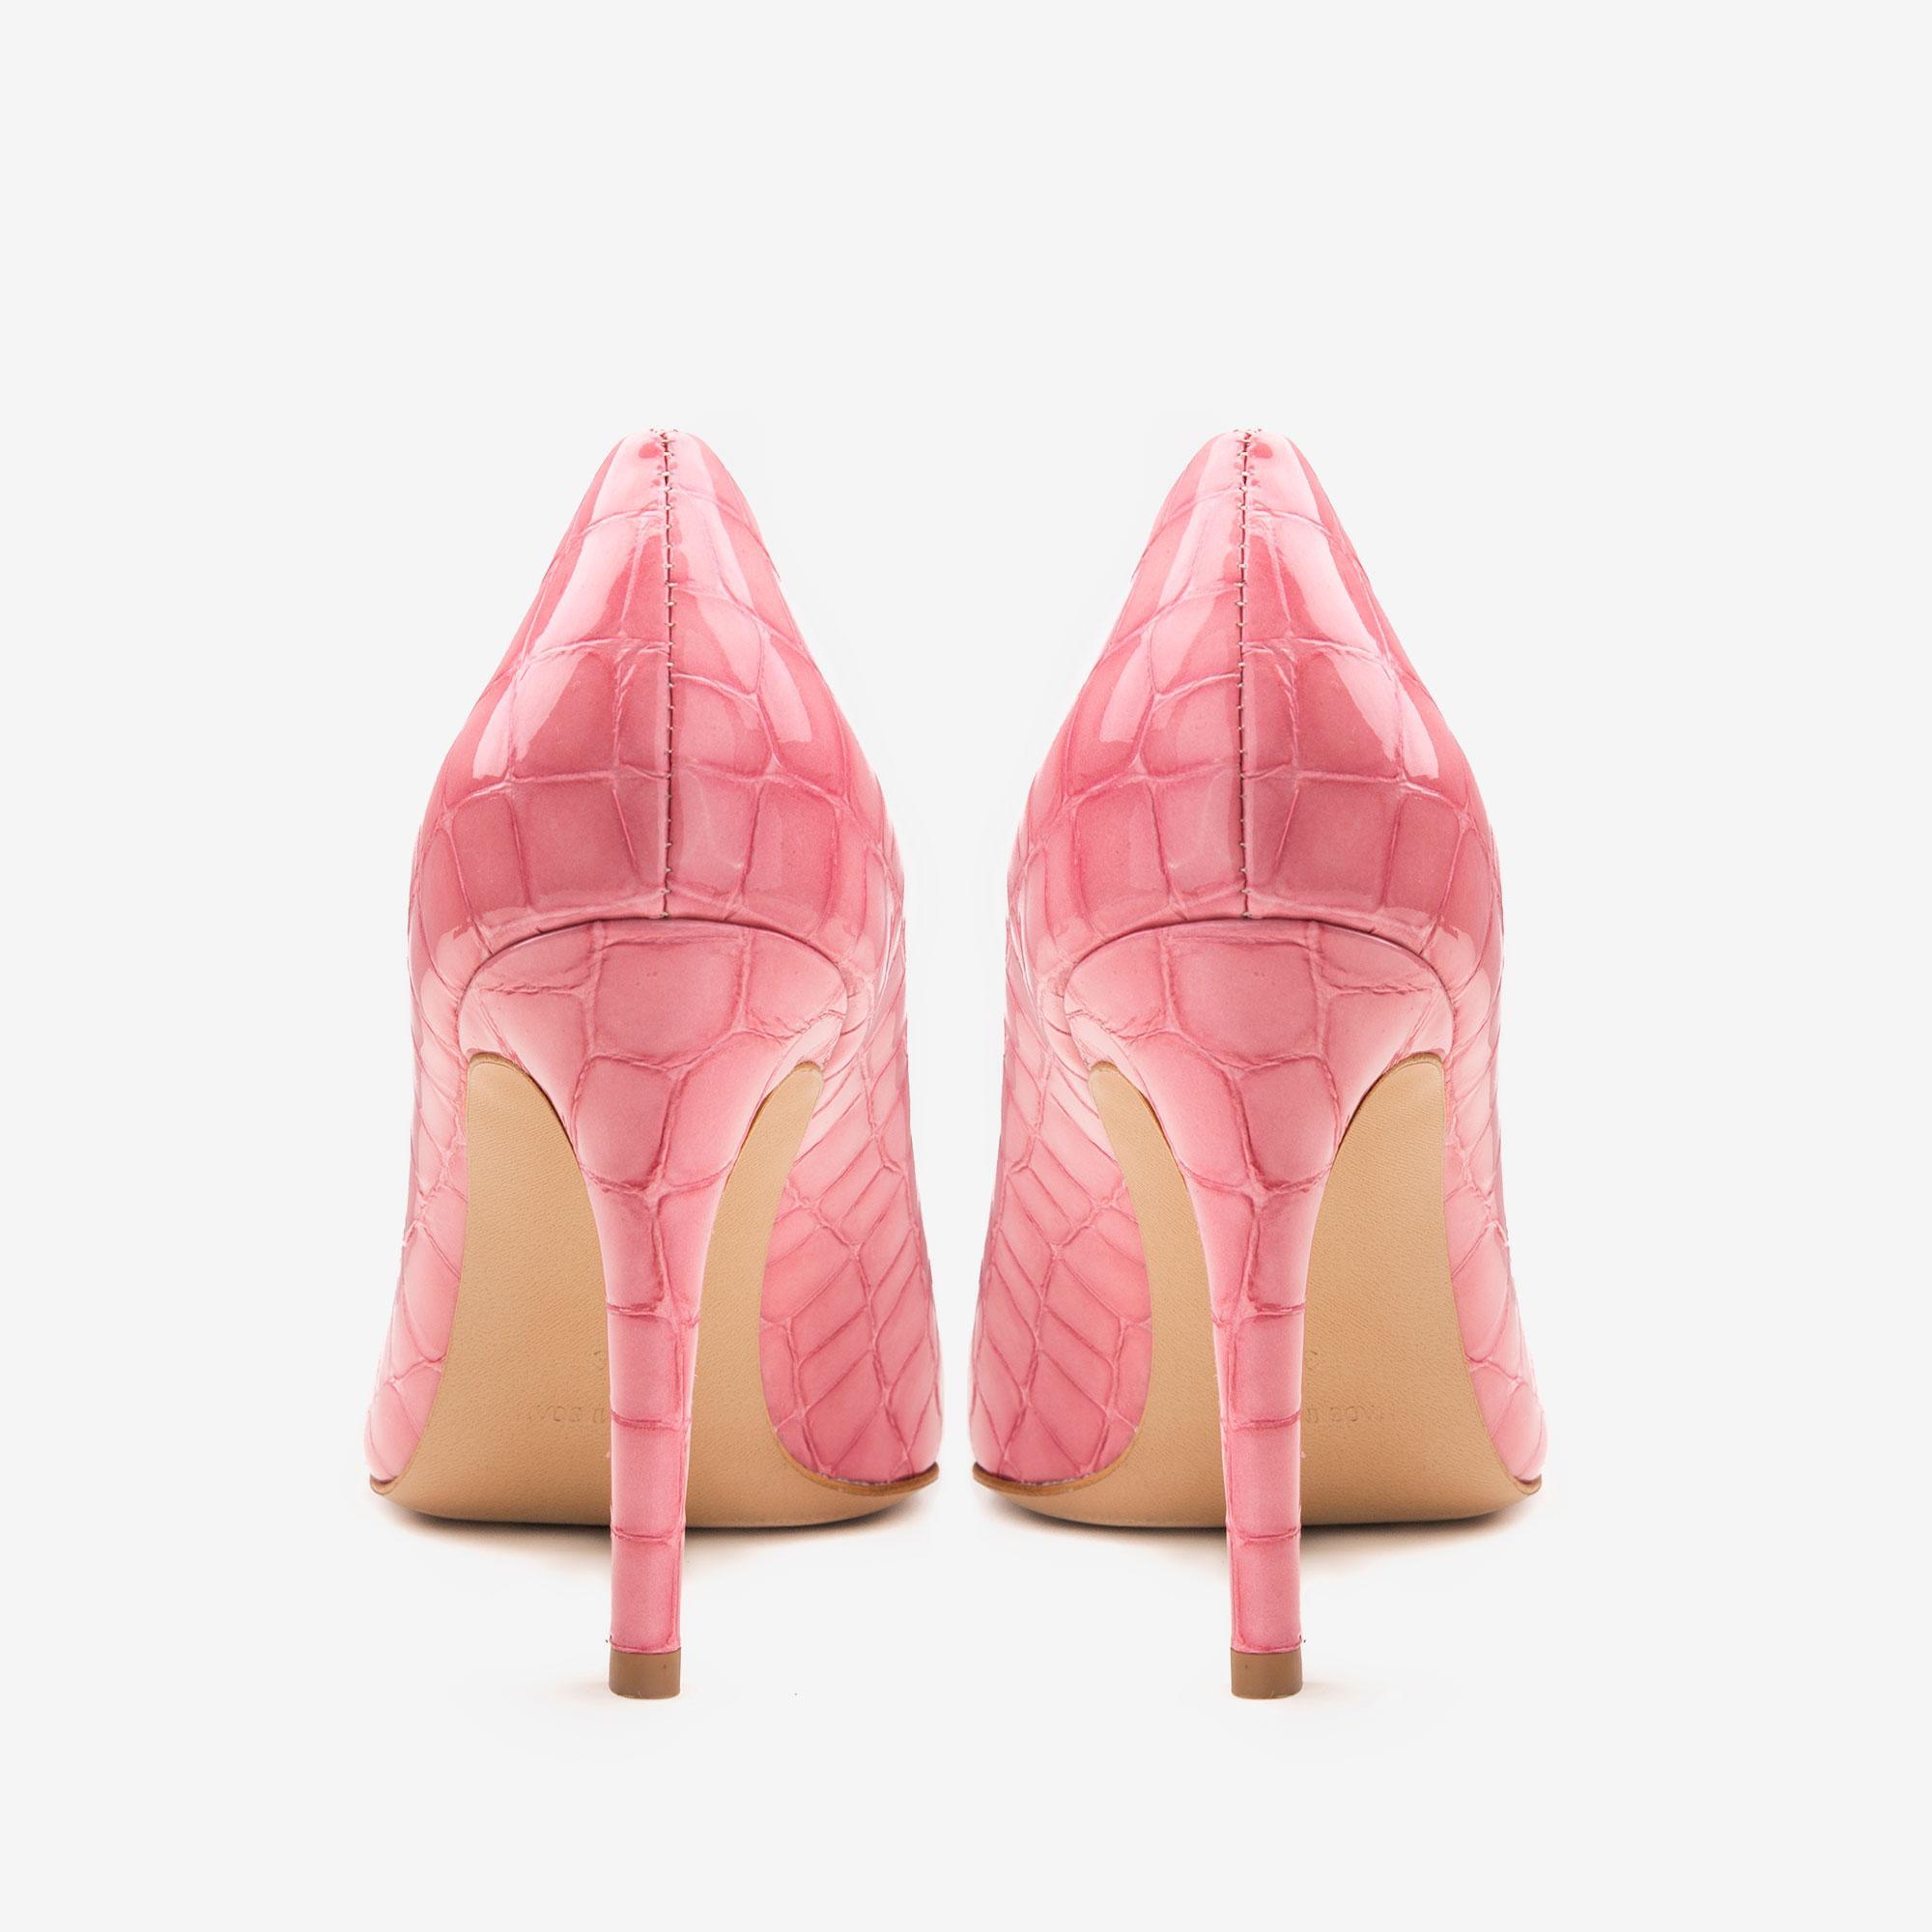 Pantofi cu varf ascutit din piele croco roz Ginissima imagine 3